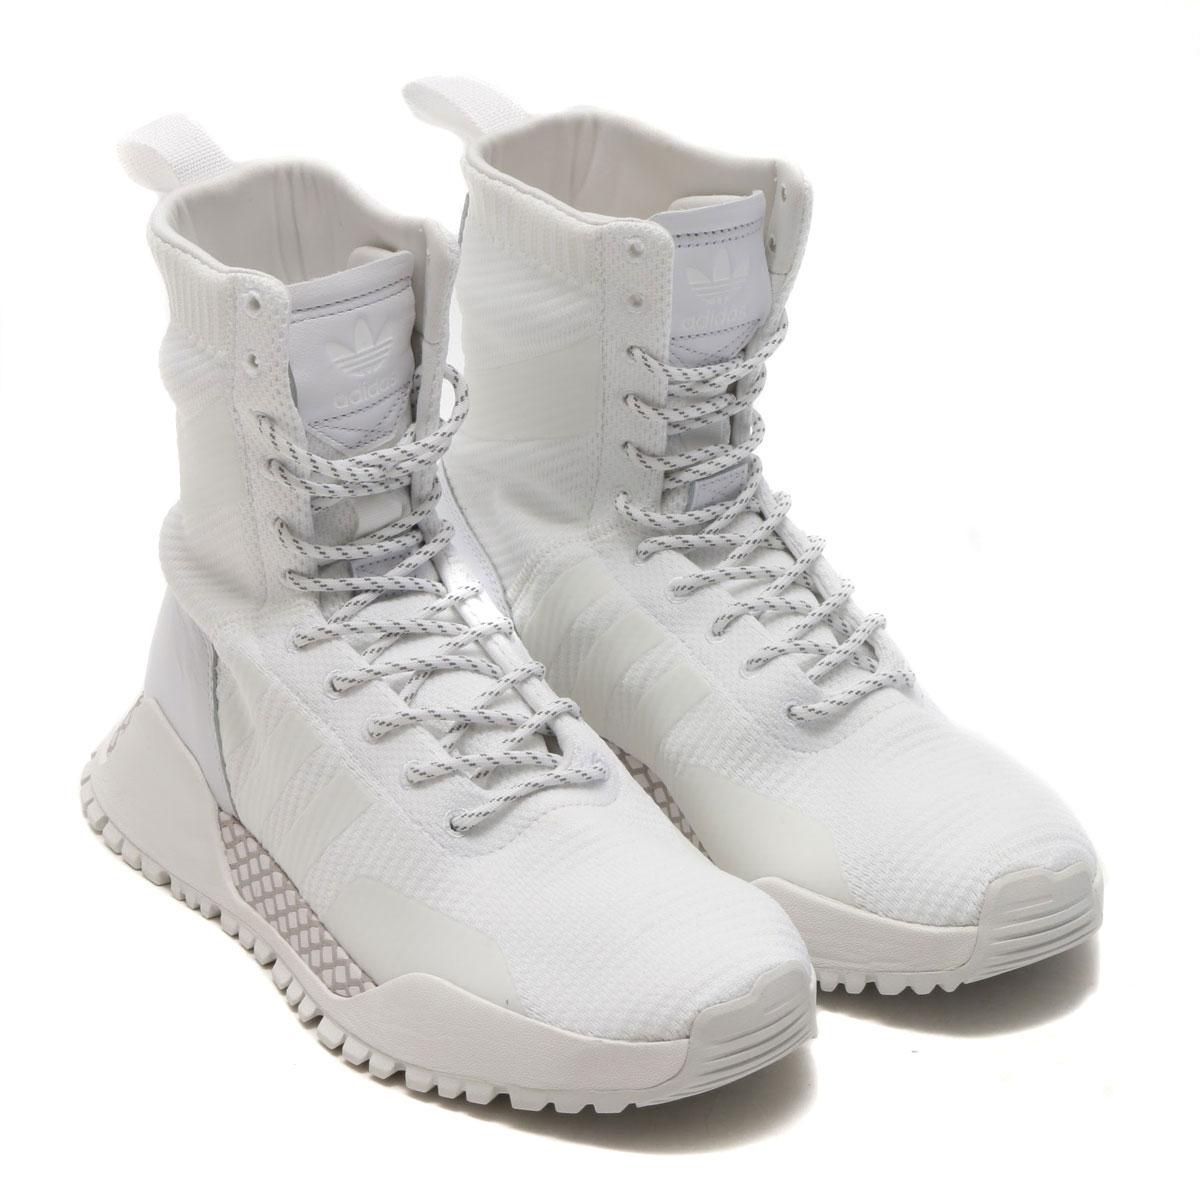 adidas Originals H.F/1.3 PK (Running White/Running White/Vintage White) 【メンズサイズ】【17FW-I】